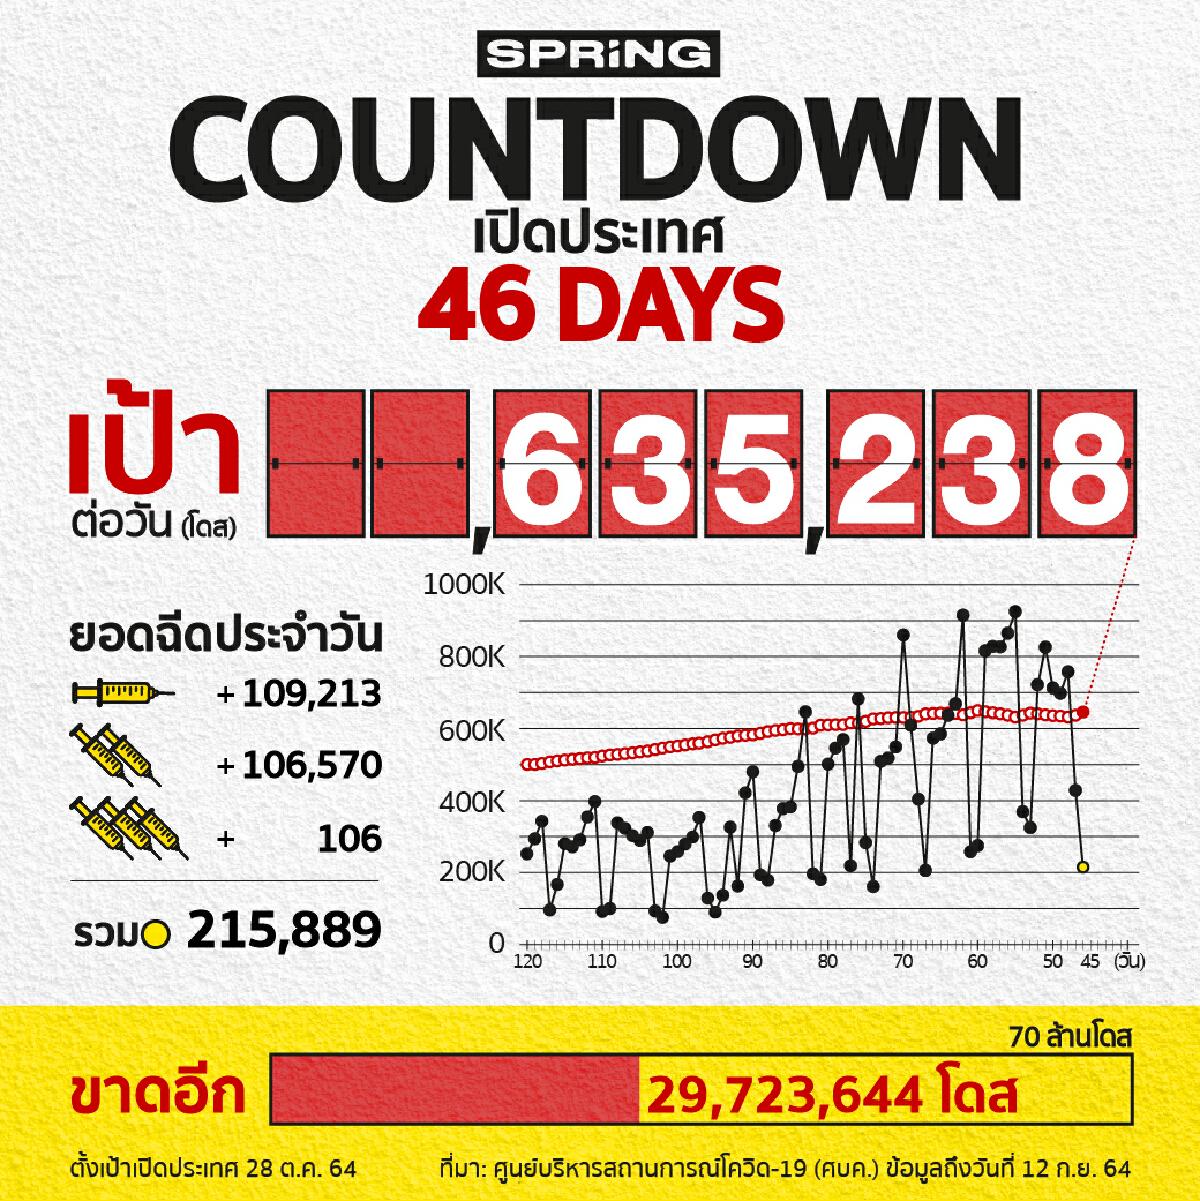 COUNTDOWN! เปิดประเทศใน 46 วัน ฉีดวัคซีนโควิด 215,889 โดส